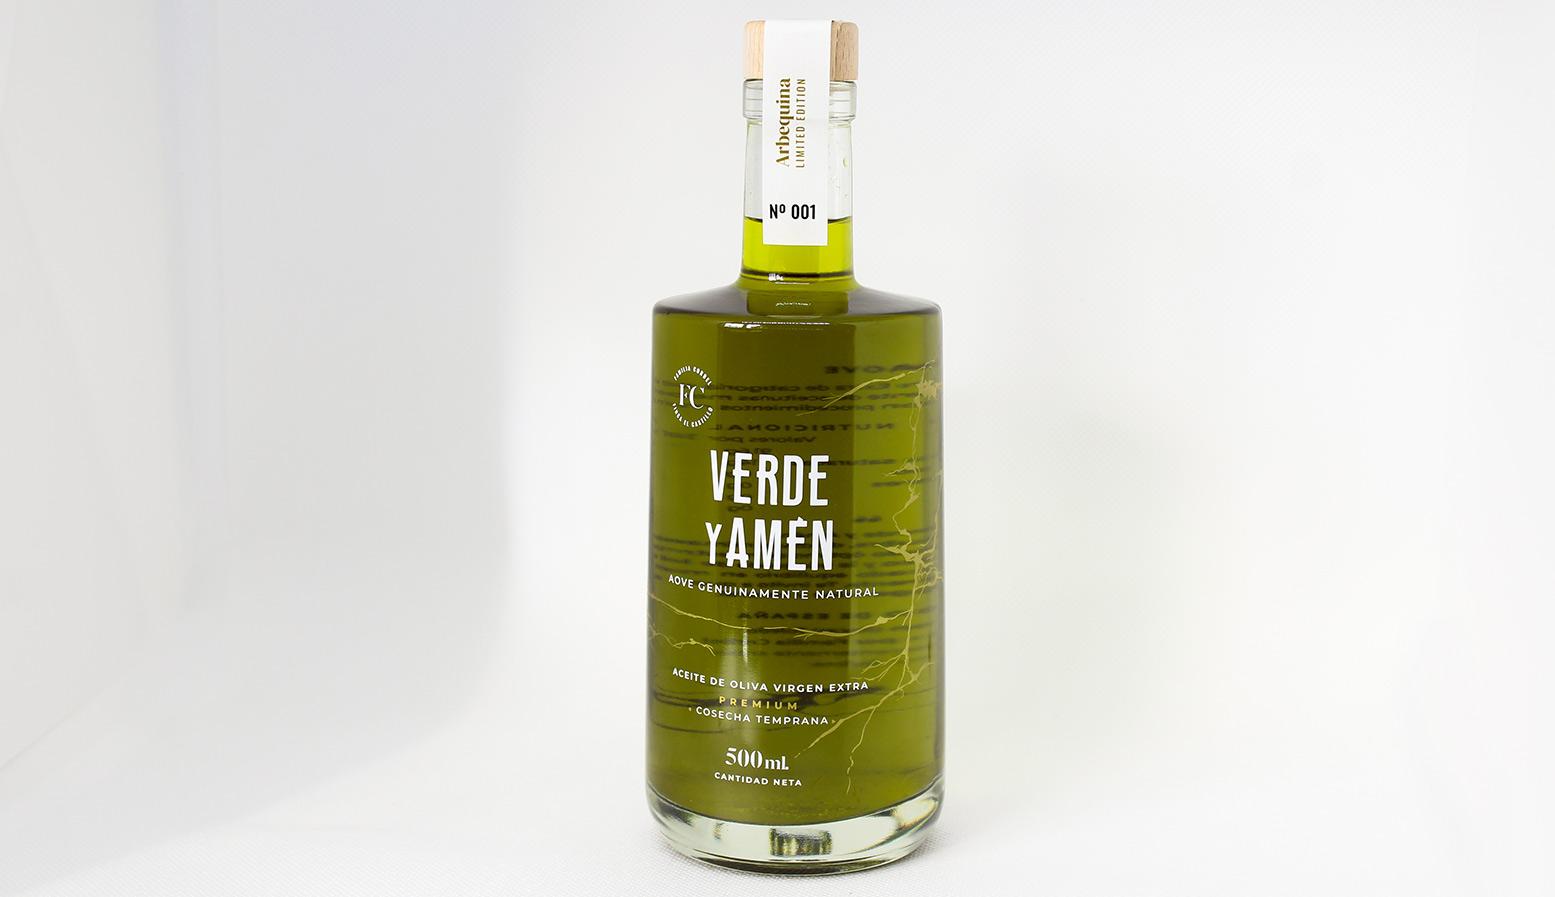 Aceite de Oliva Virgen Extra Cosecha Extra Temprana Verde y Amén Arbequina